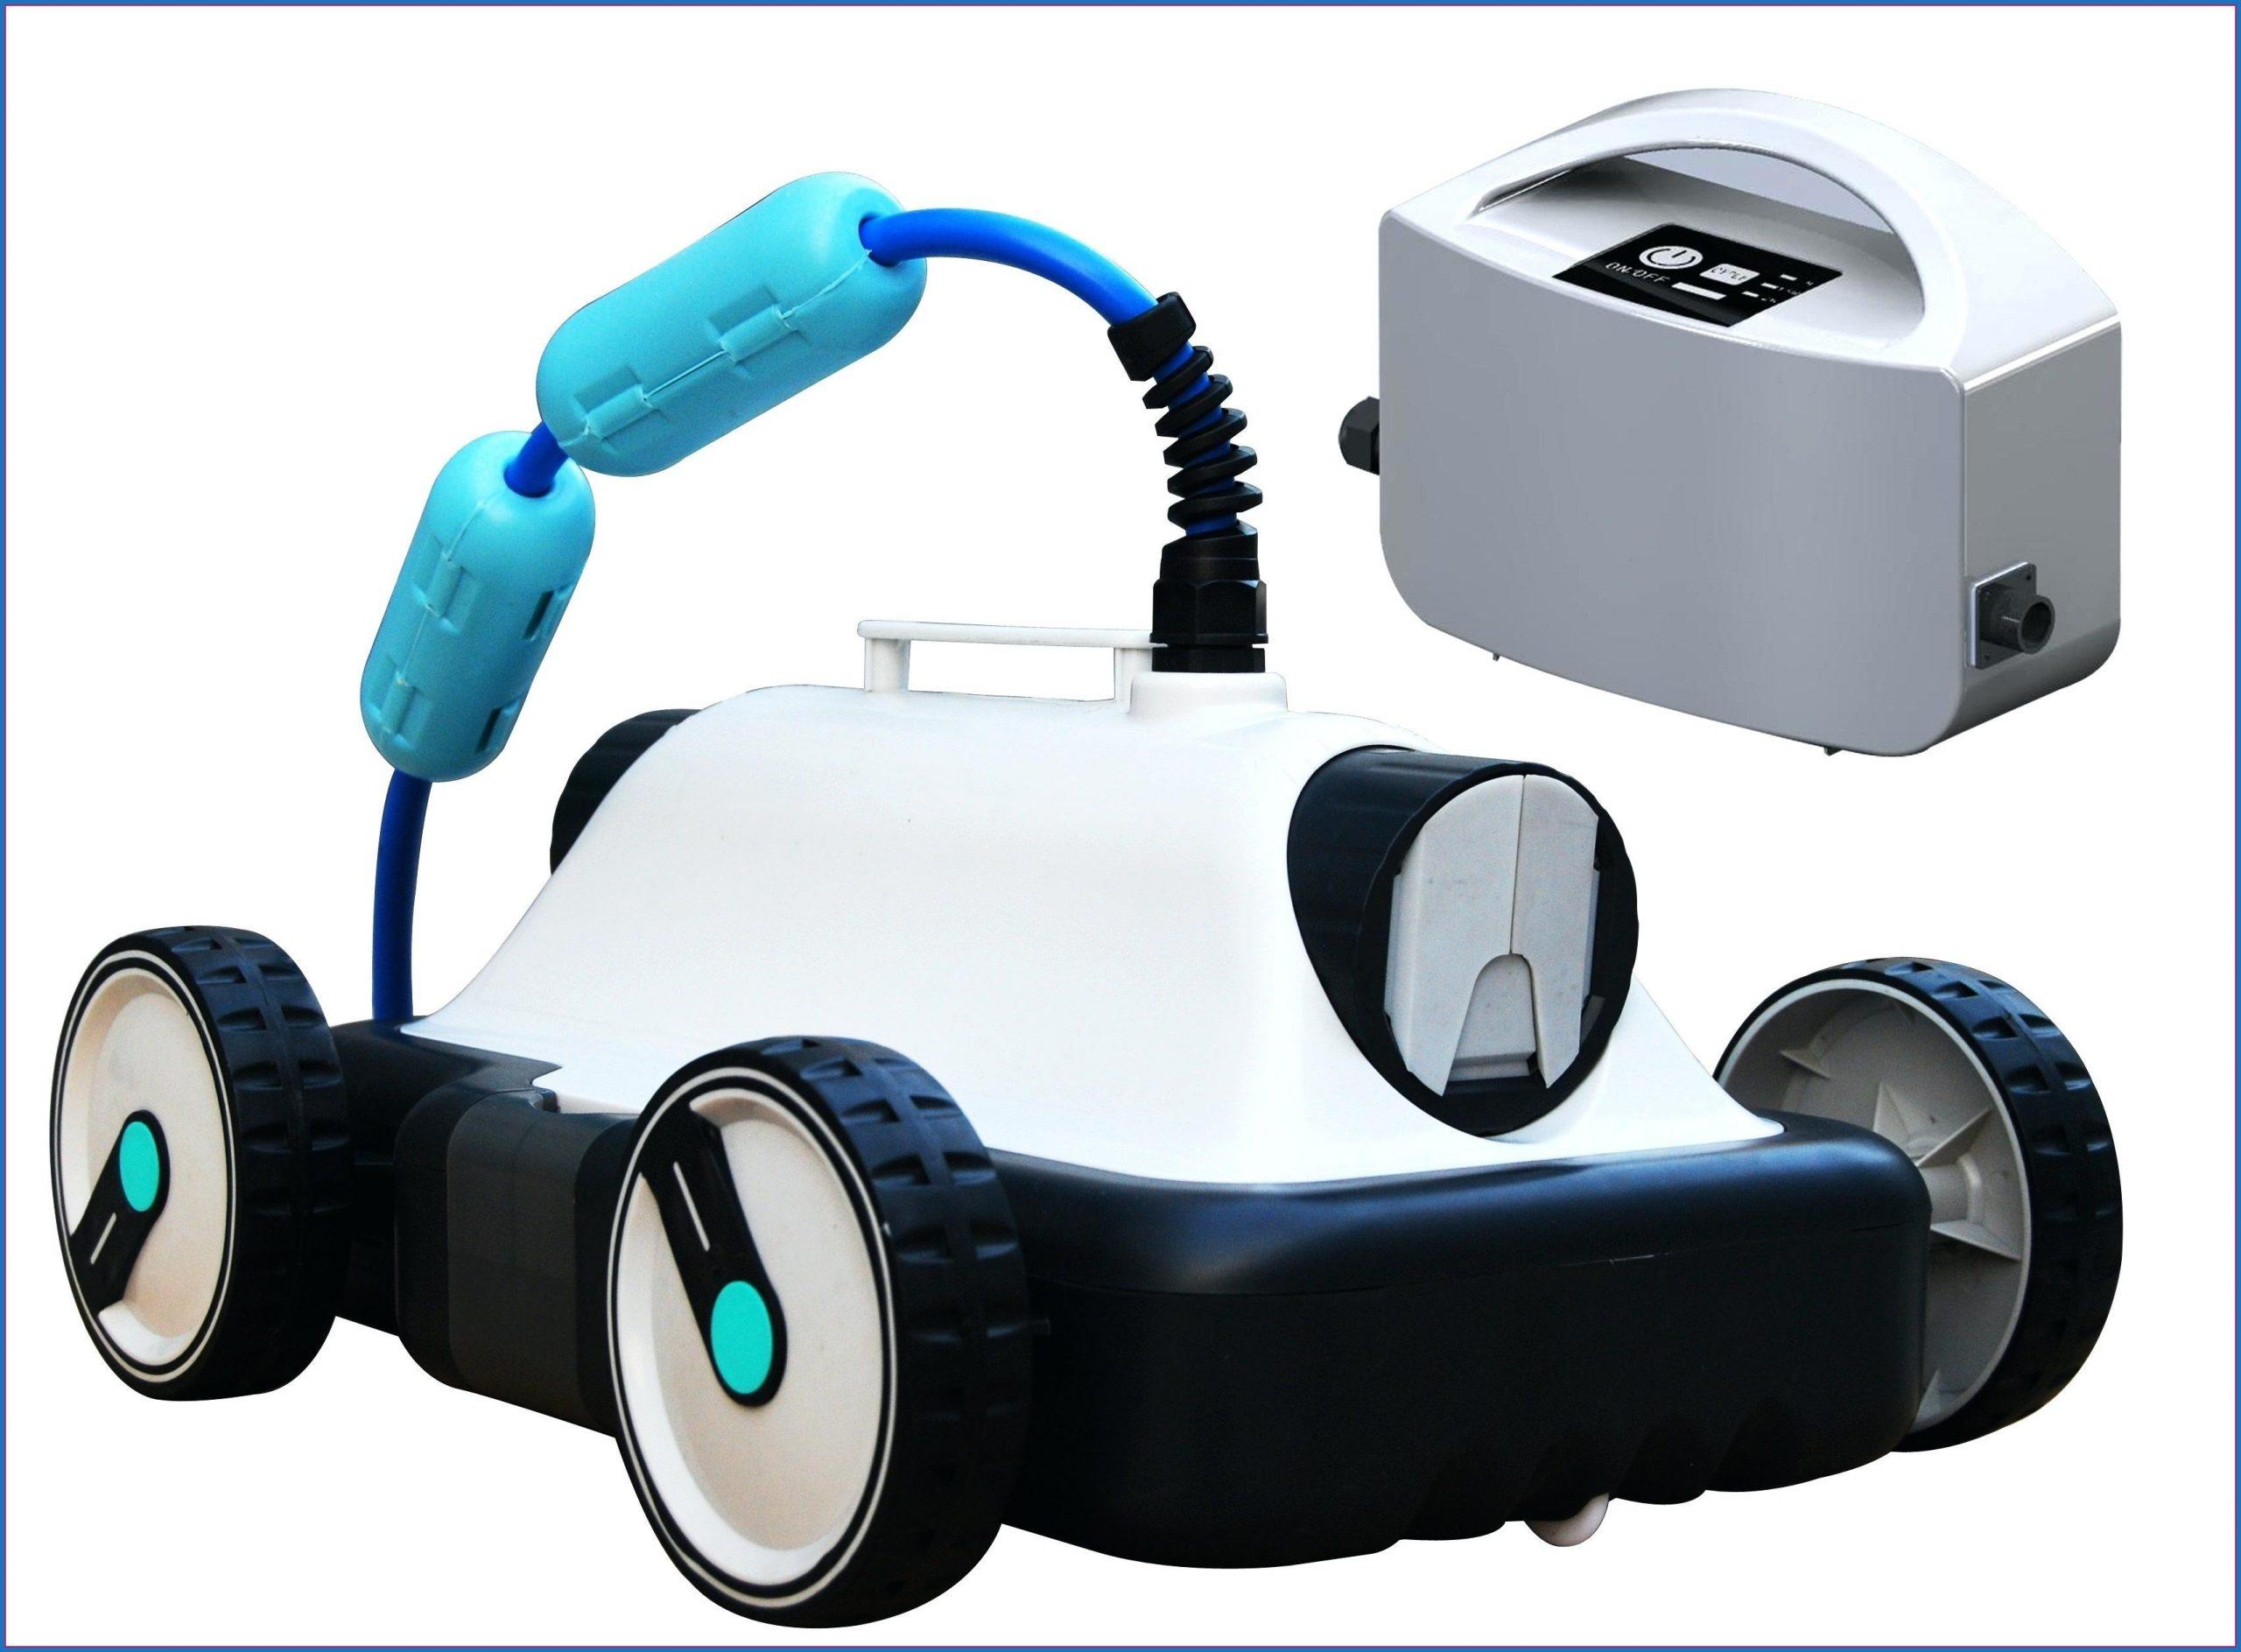 Castorama Robot De Piscine – Gamboahinestrosa avec Aspirateur Piscine Castorama